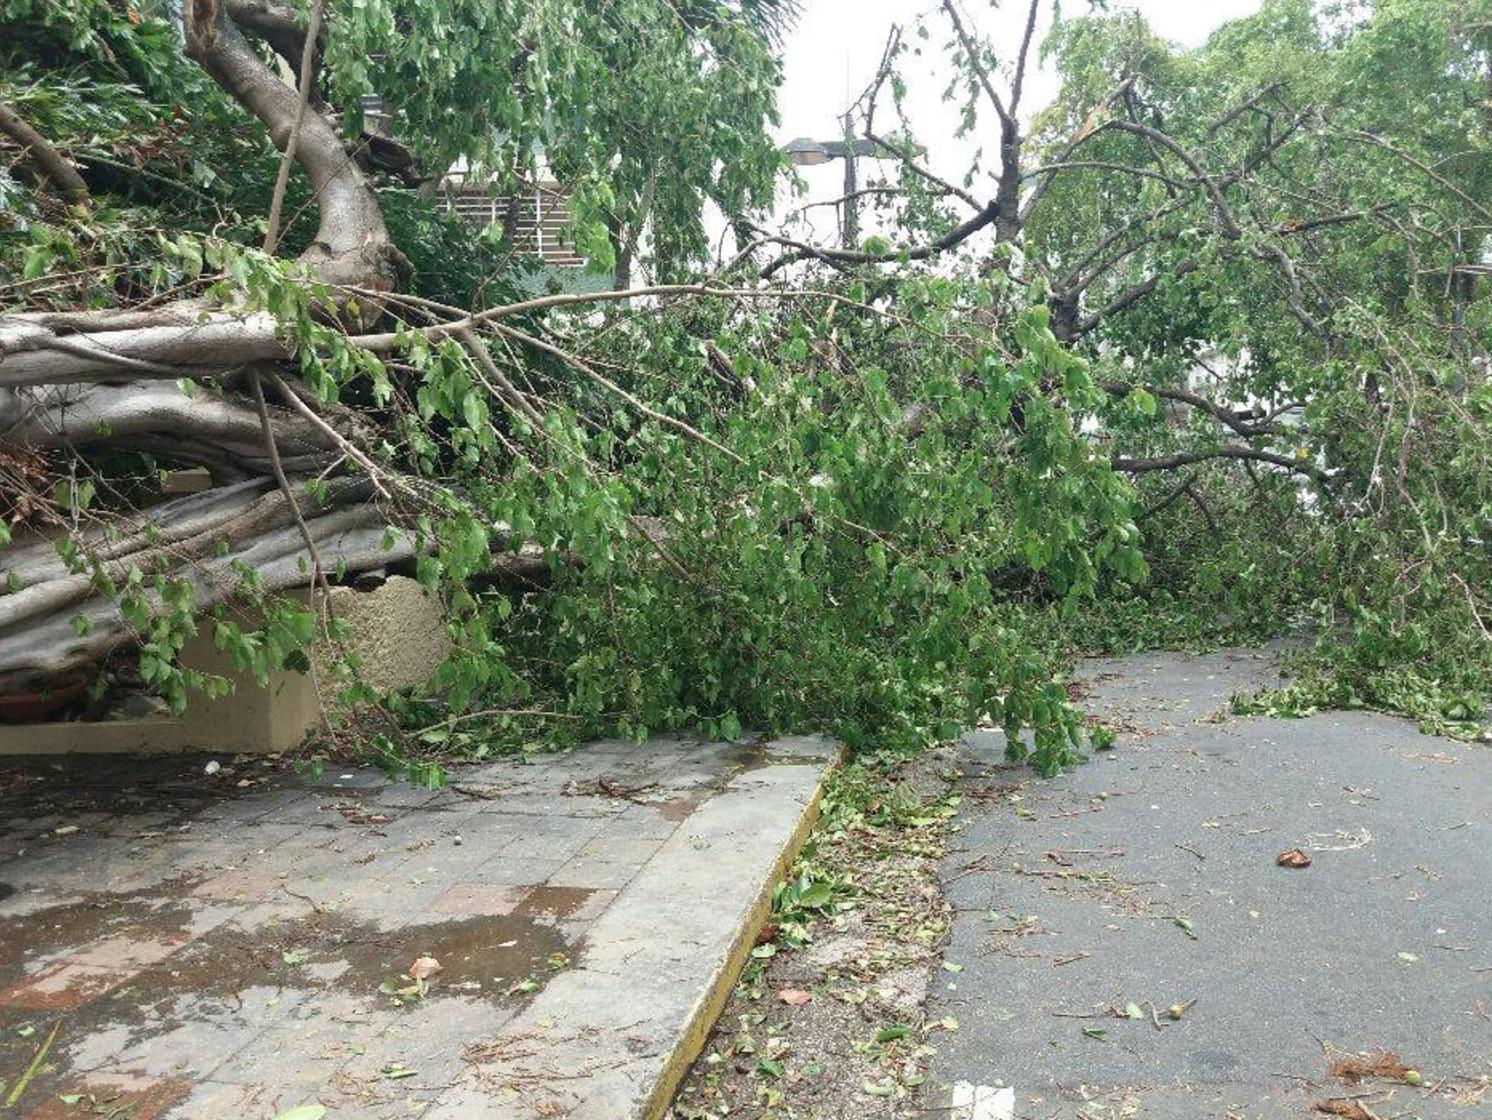 Hurricane Irma Destruction In Puerto Rico Photo: Rachel Gikas, Condado